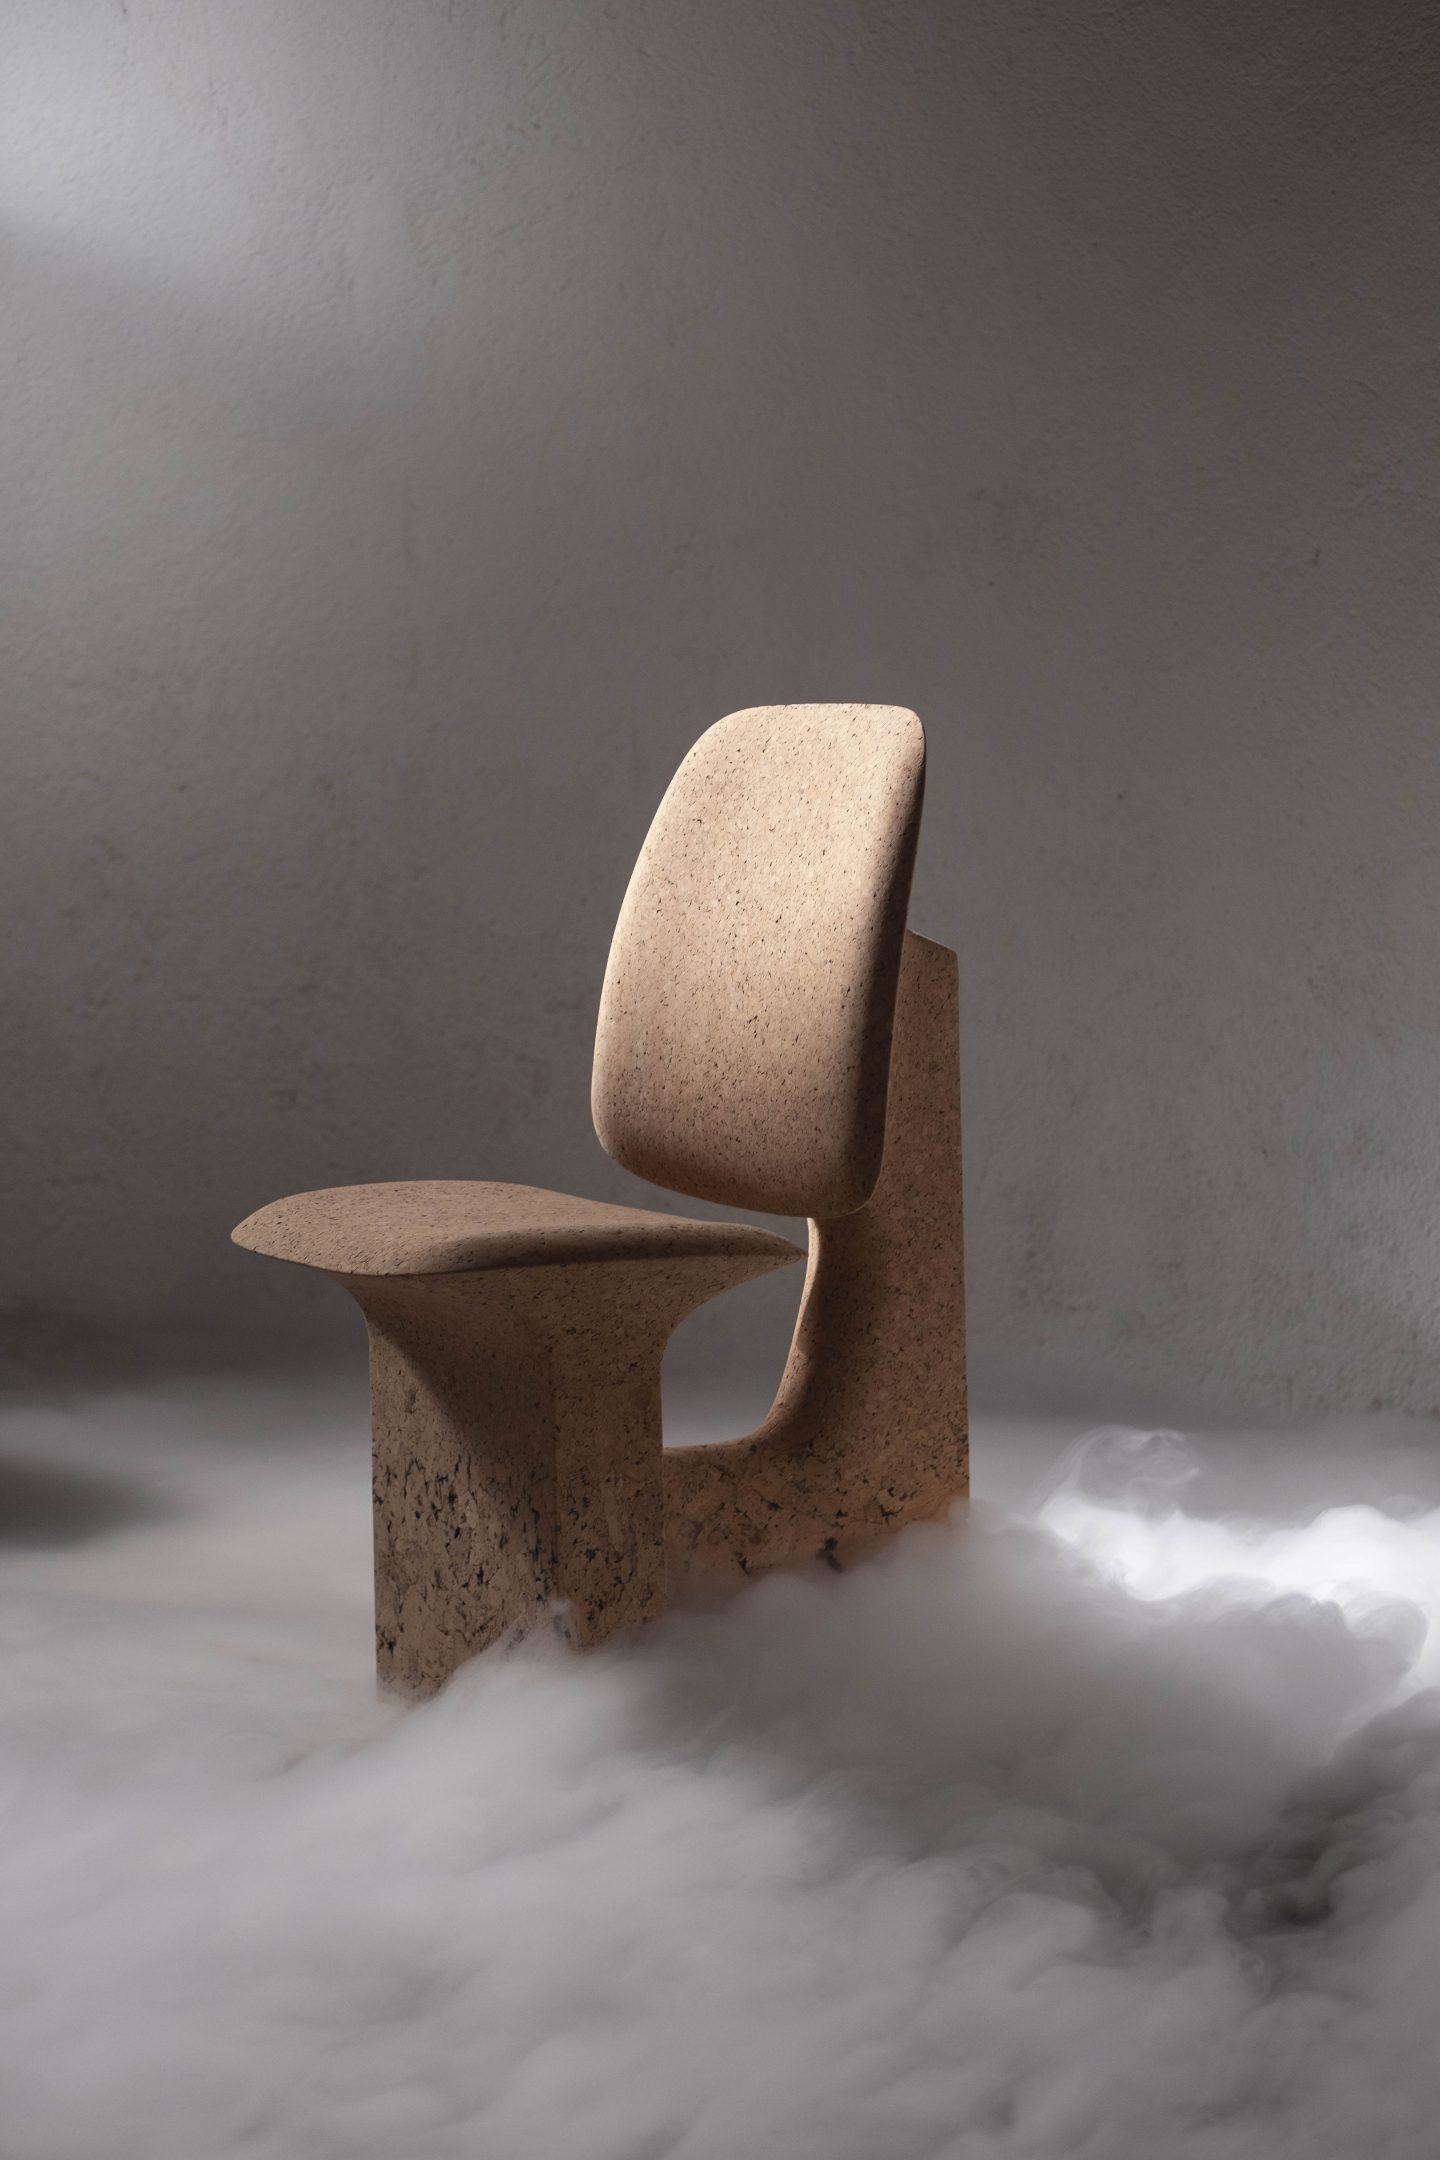 IGNANT-Design-Burnt-Cork-Noé-Duchaufour-8